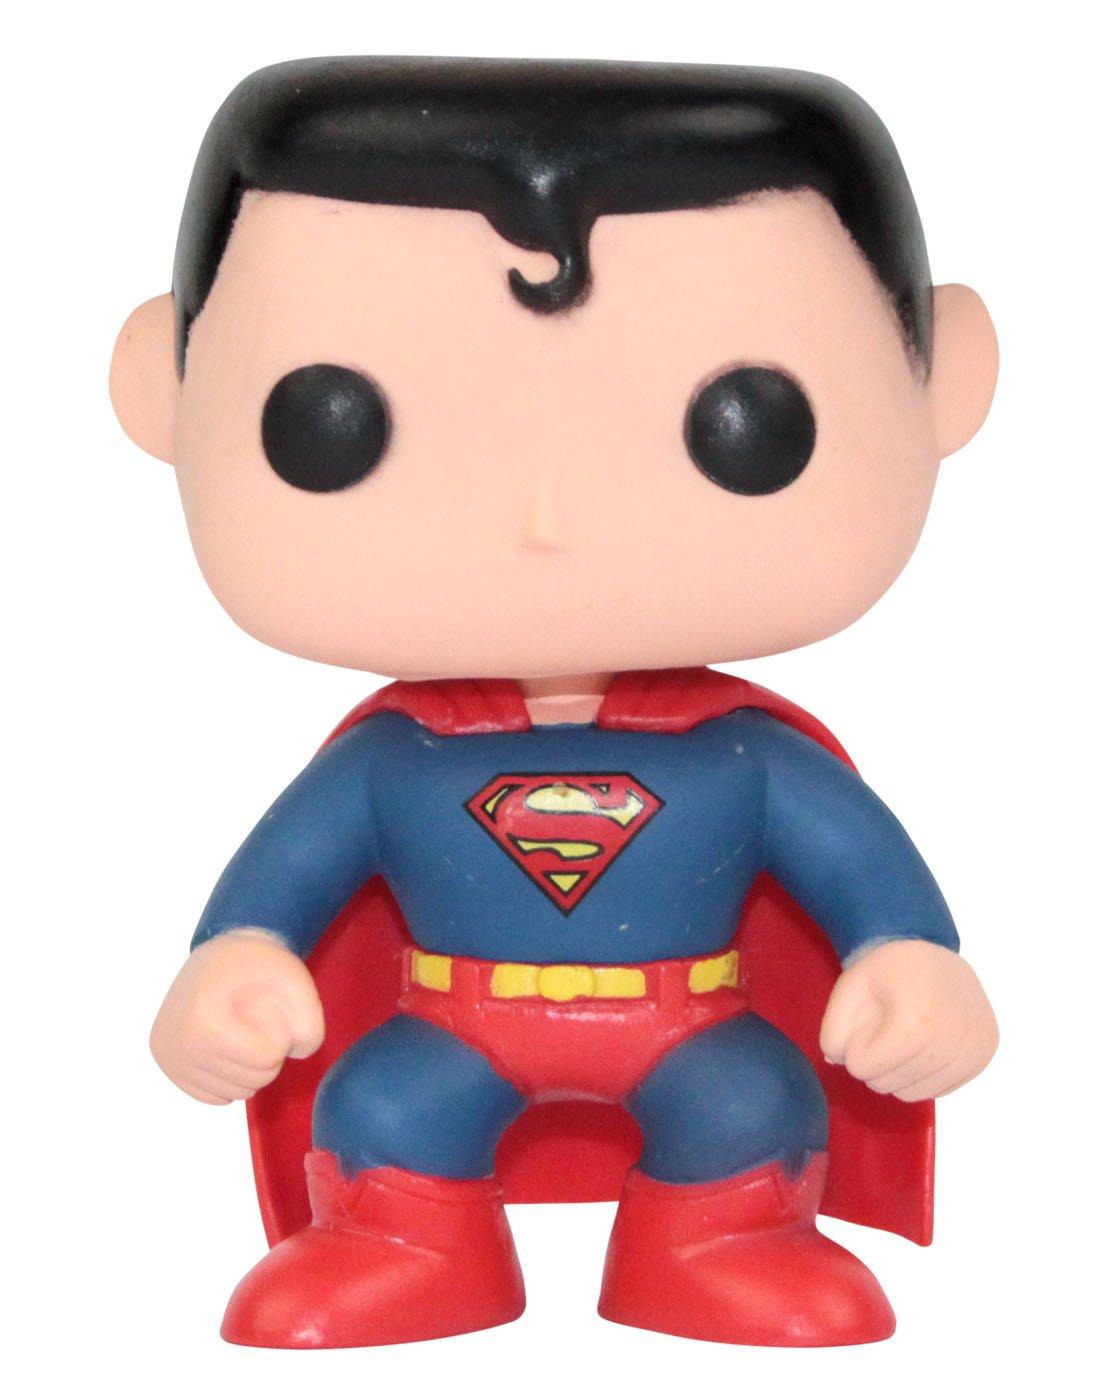 Unisex-Erwachsener - Funko - Superman - Funko Pop